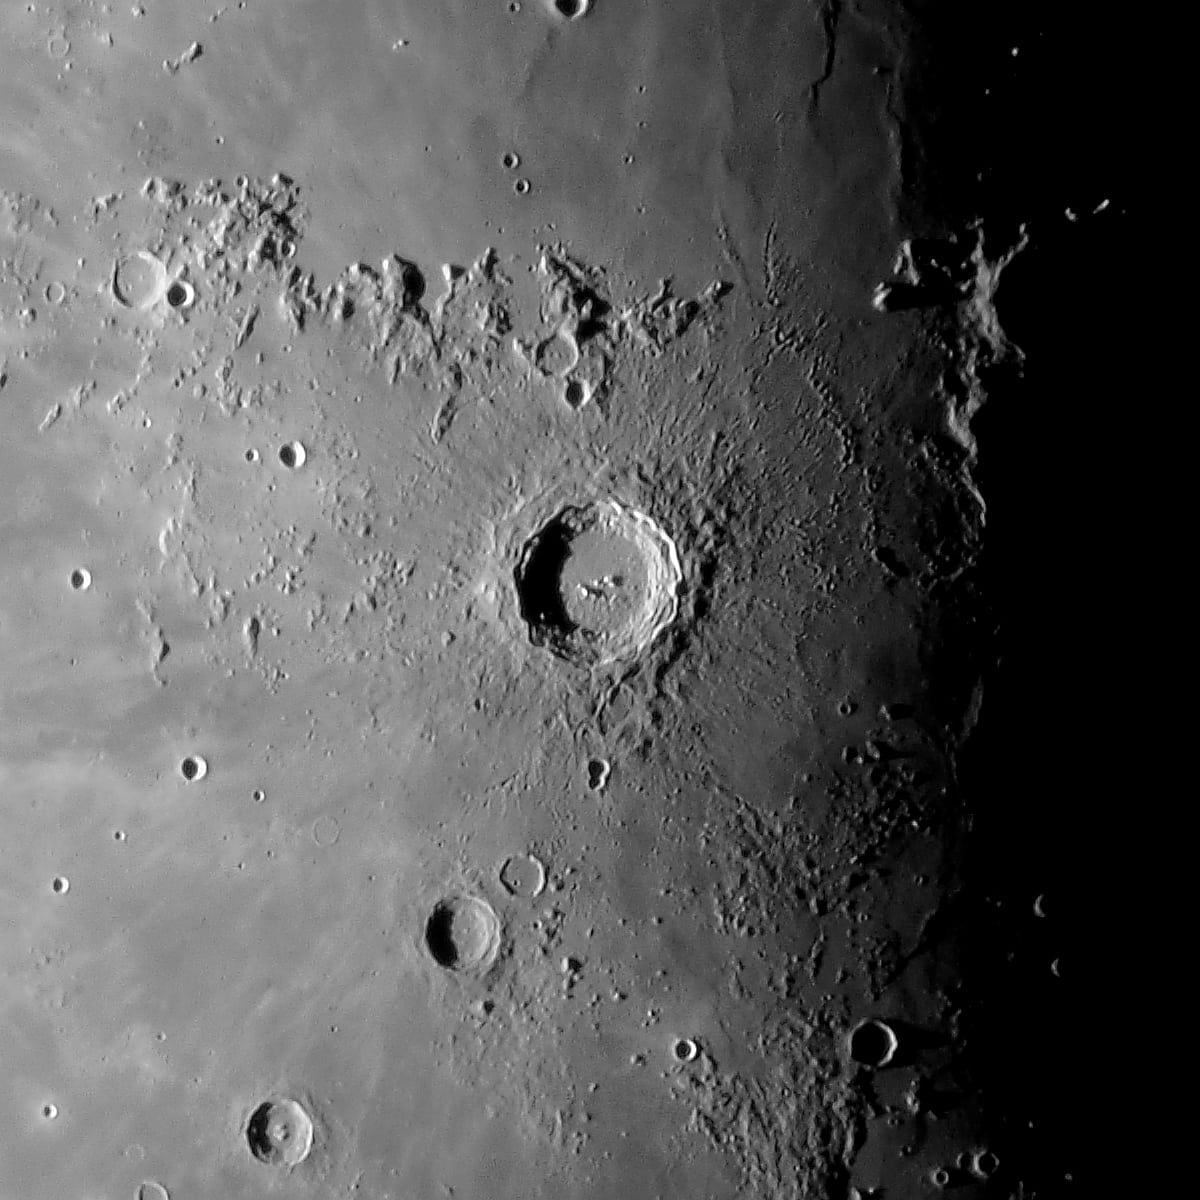 Kopernikus bei abnehmendem Mond